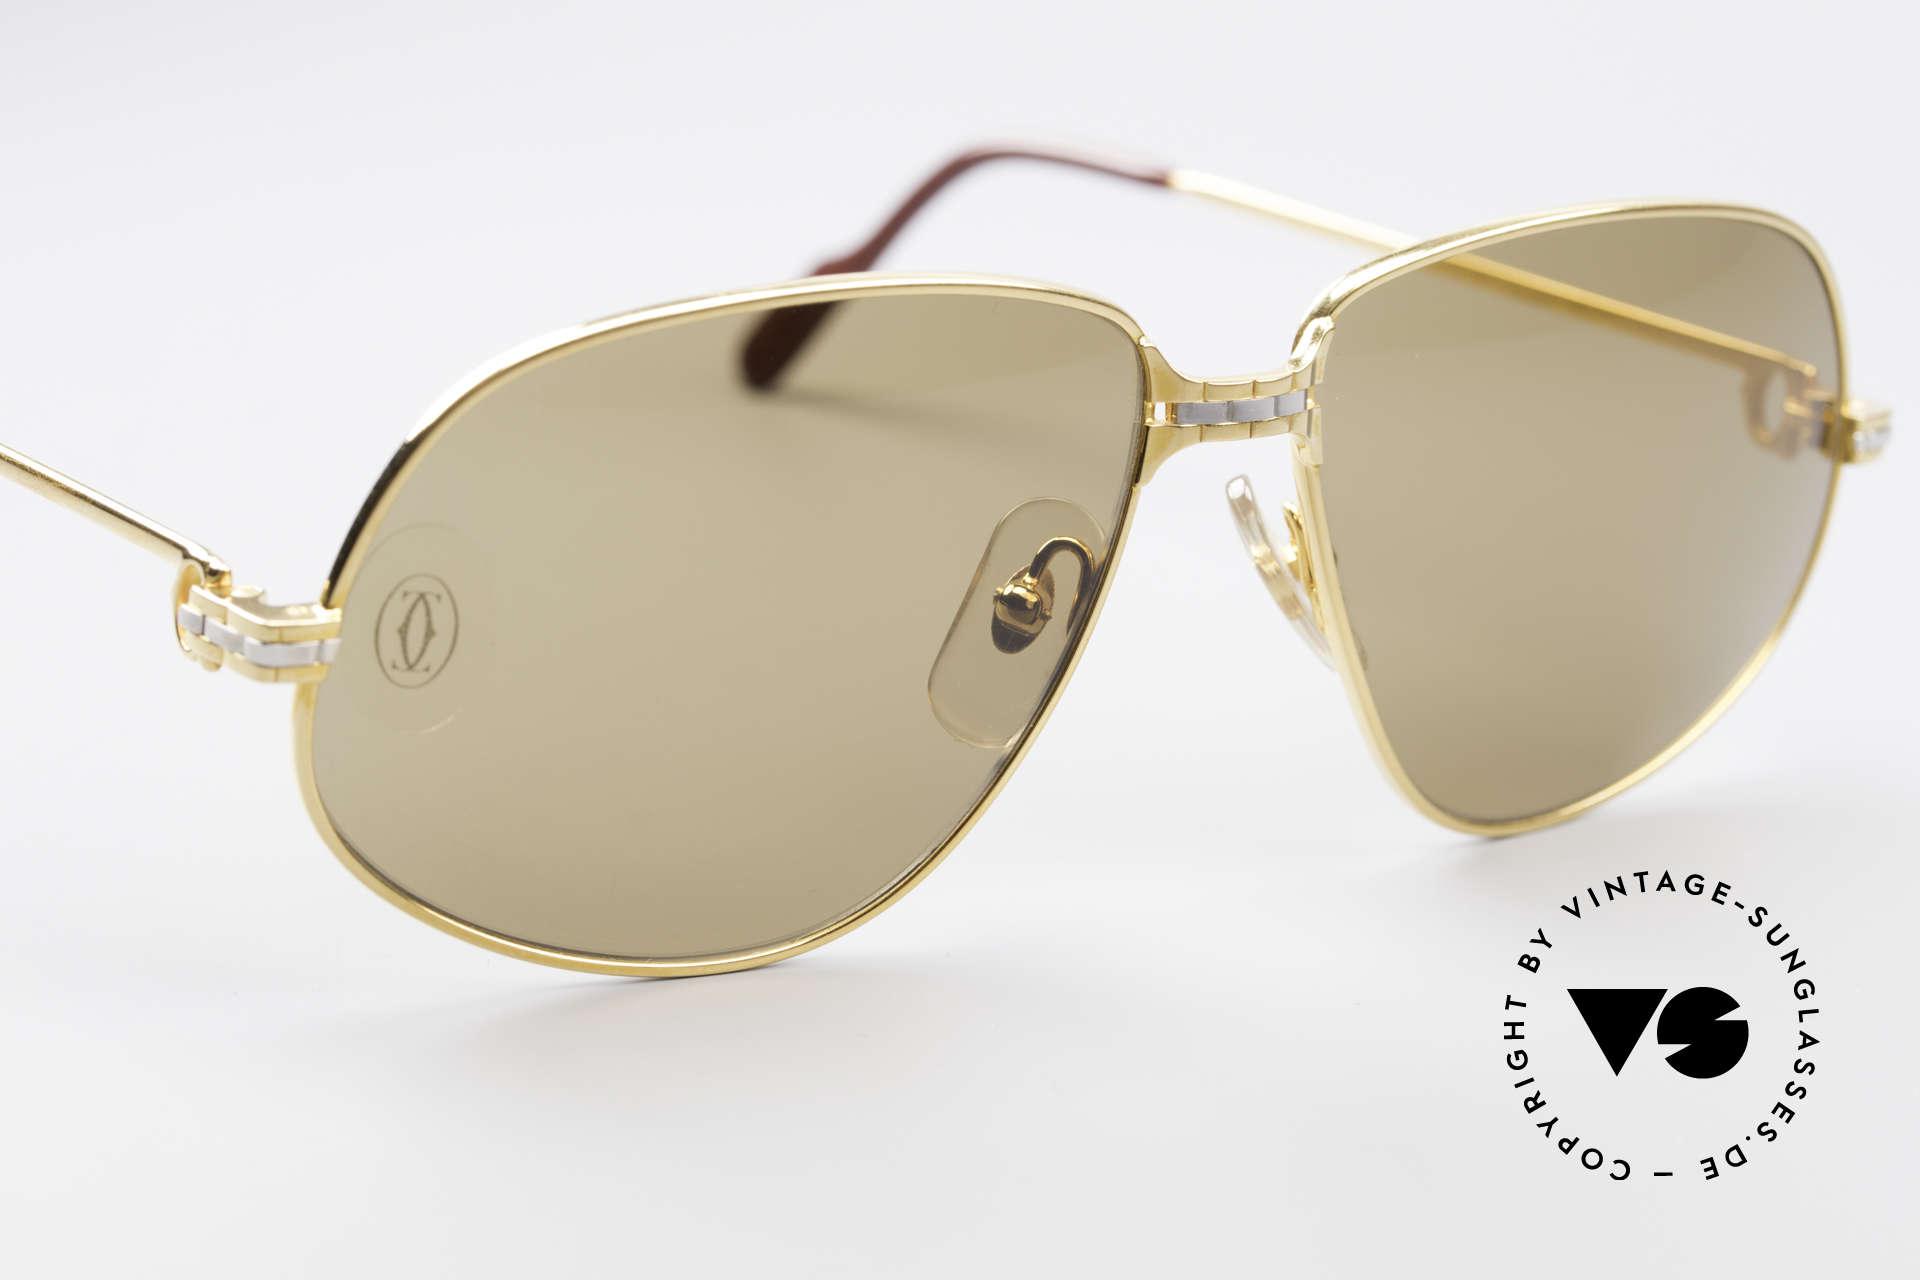 Cartier Panthere G.M. - L Rare Luxury Sunglasses, original Cartier sun lenses with the HIDDEN Cartier logo, Made for Men